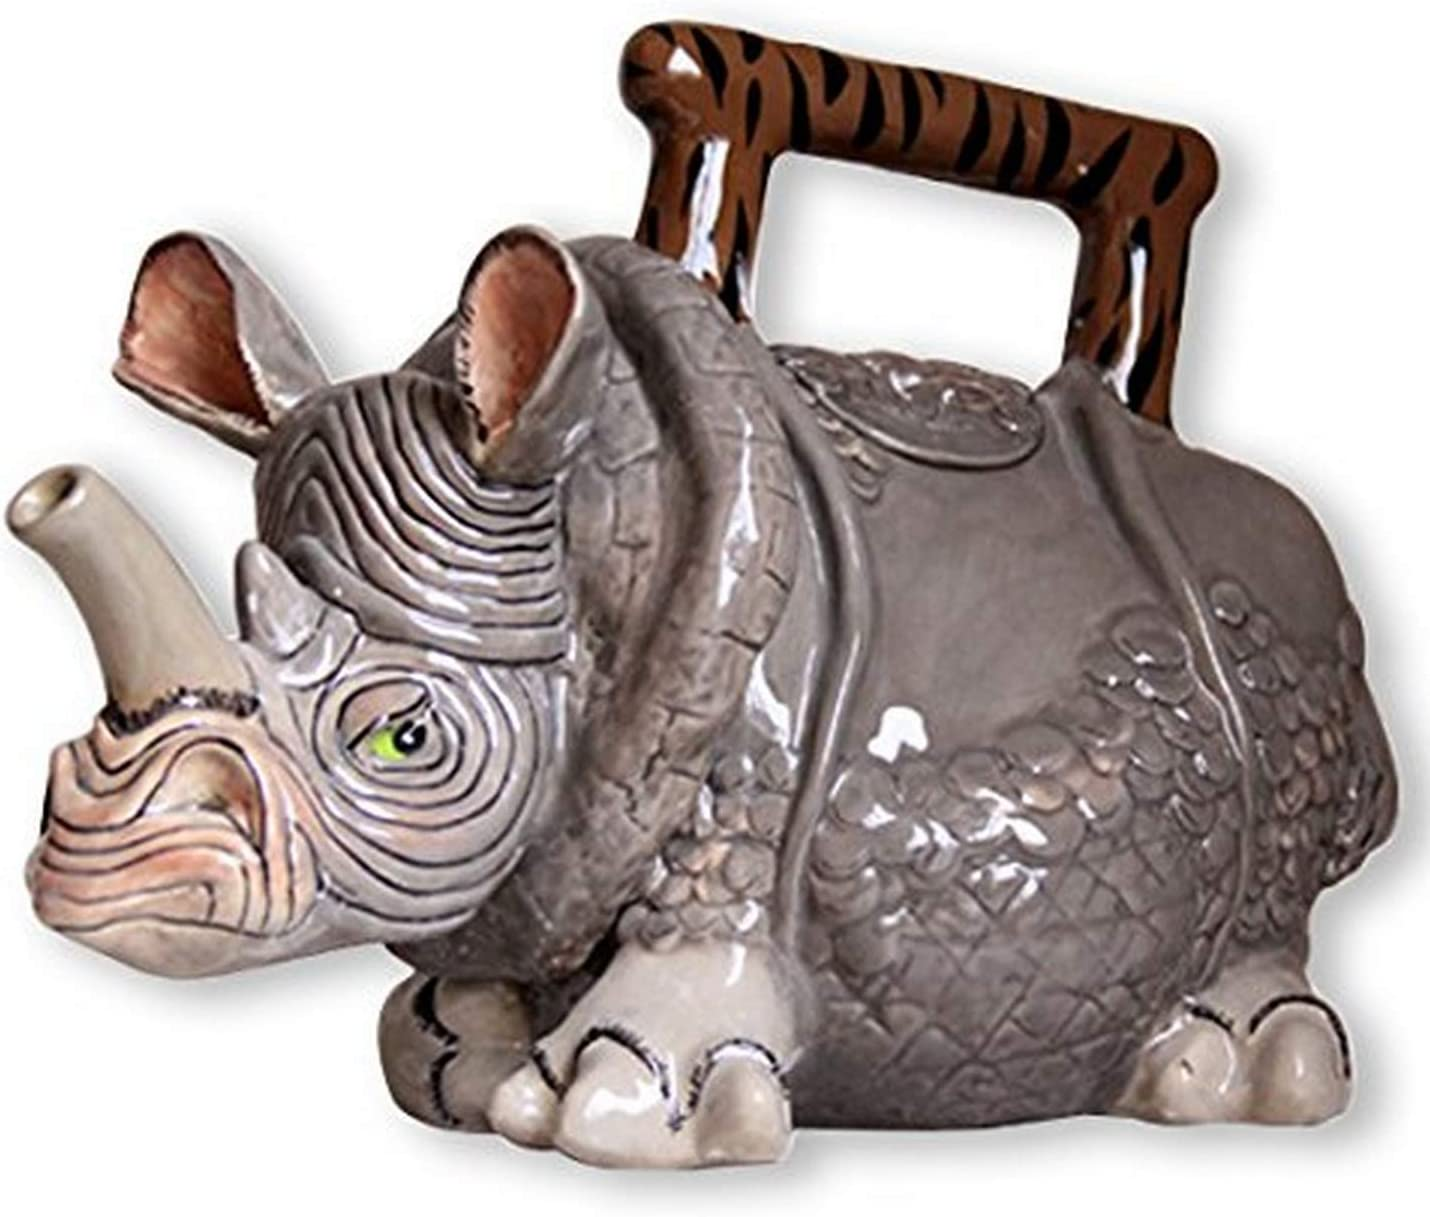 Blue Sky Ceramic Rhino Teapot, 9.5 x 5.5 x 7